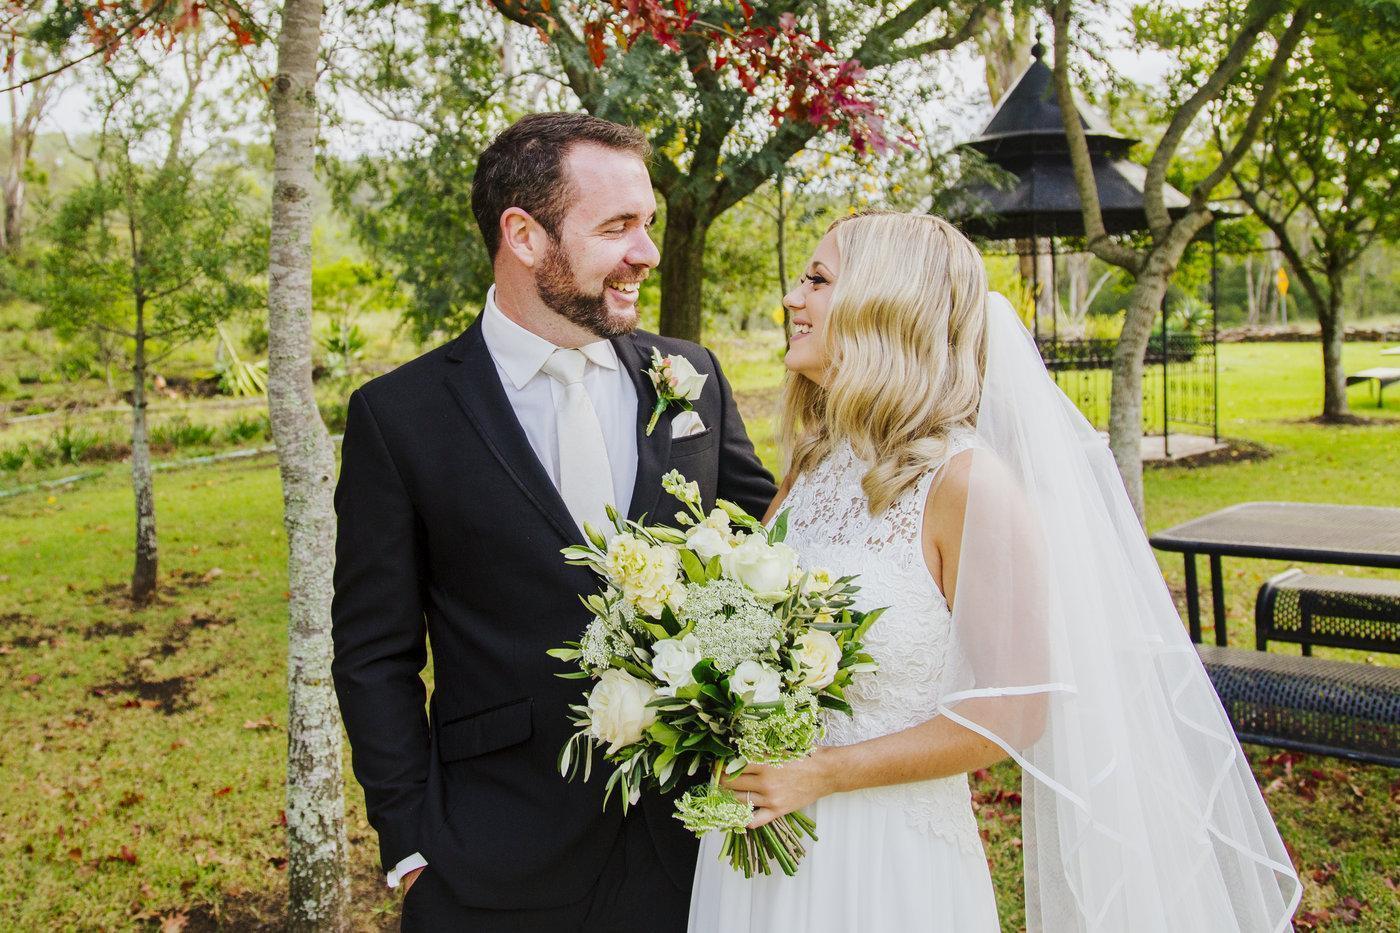 Wedding Photography couple exchanging loving glances